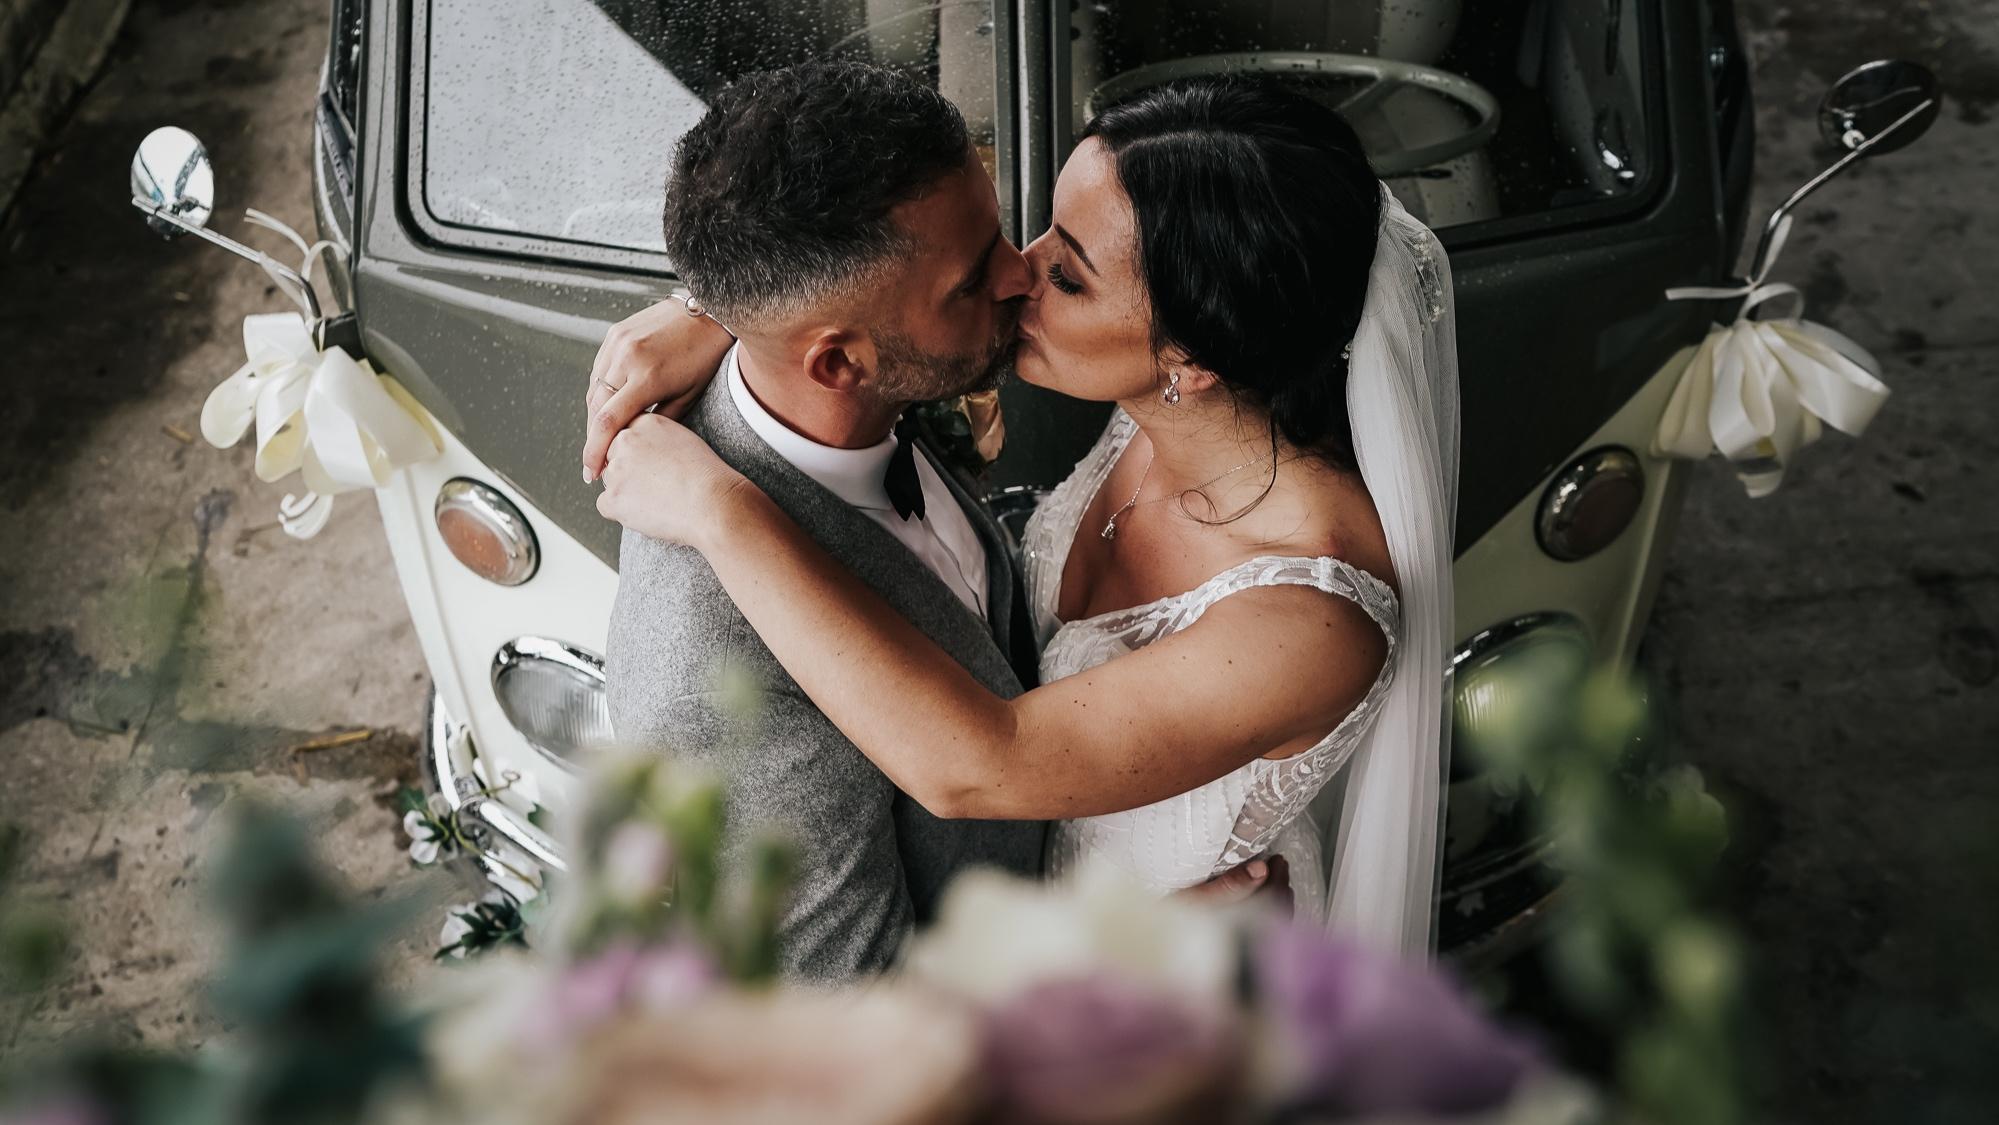 The+Hayloft+Wedding+Photography+Cheshire+wedding+photographer+%2835+of+52%29.jpg